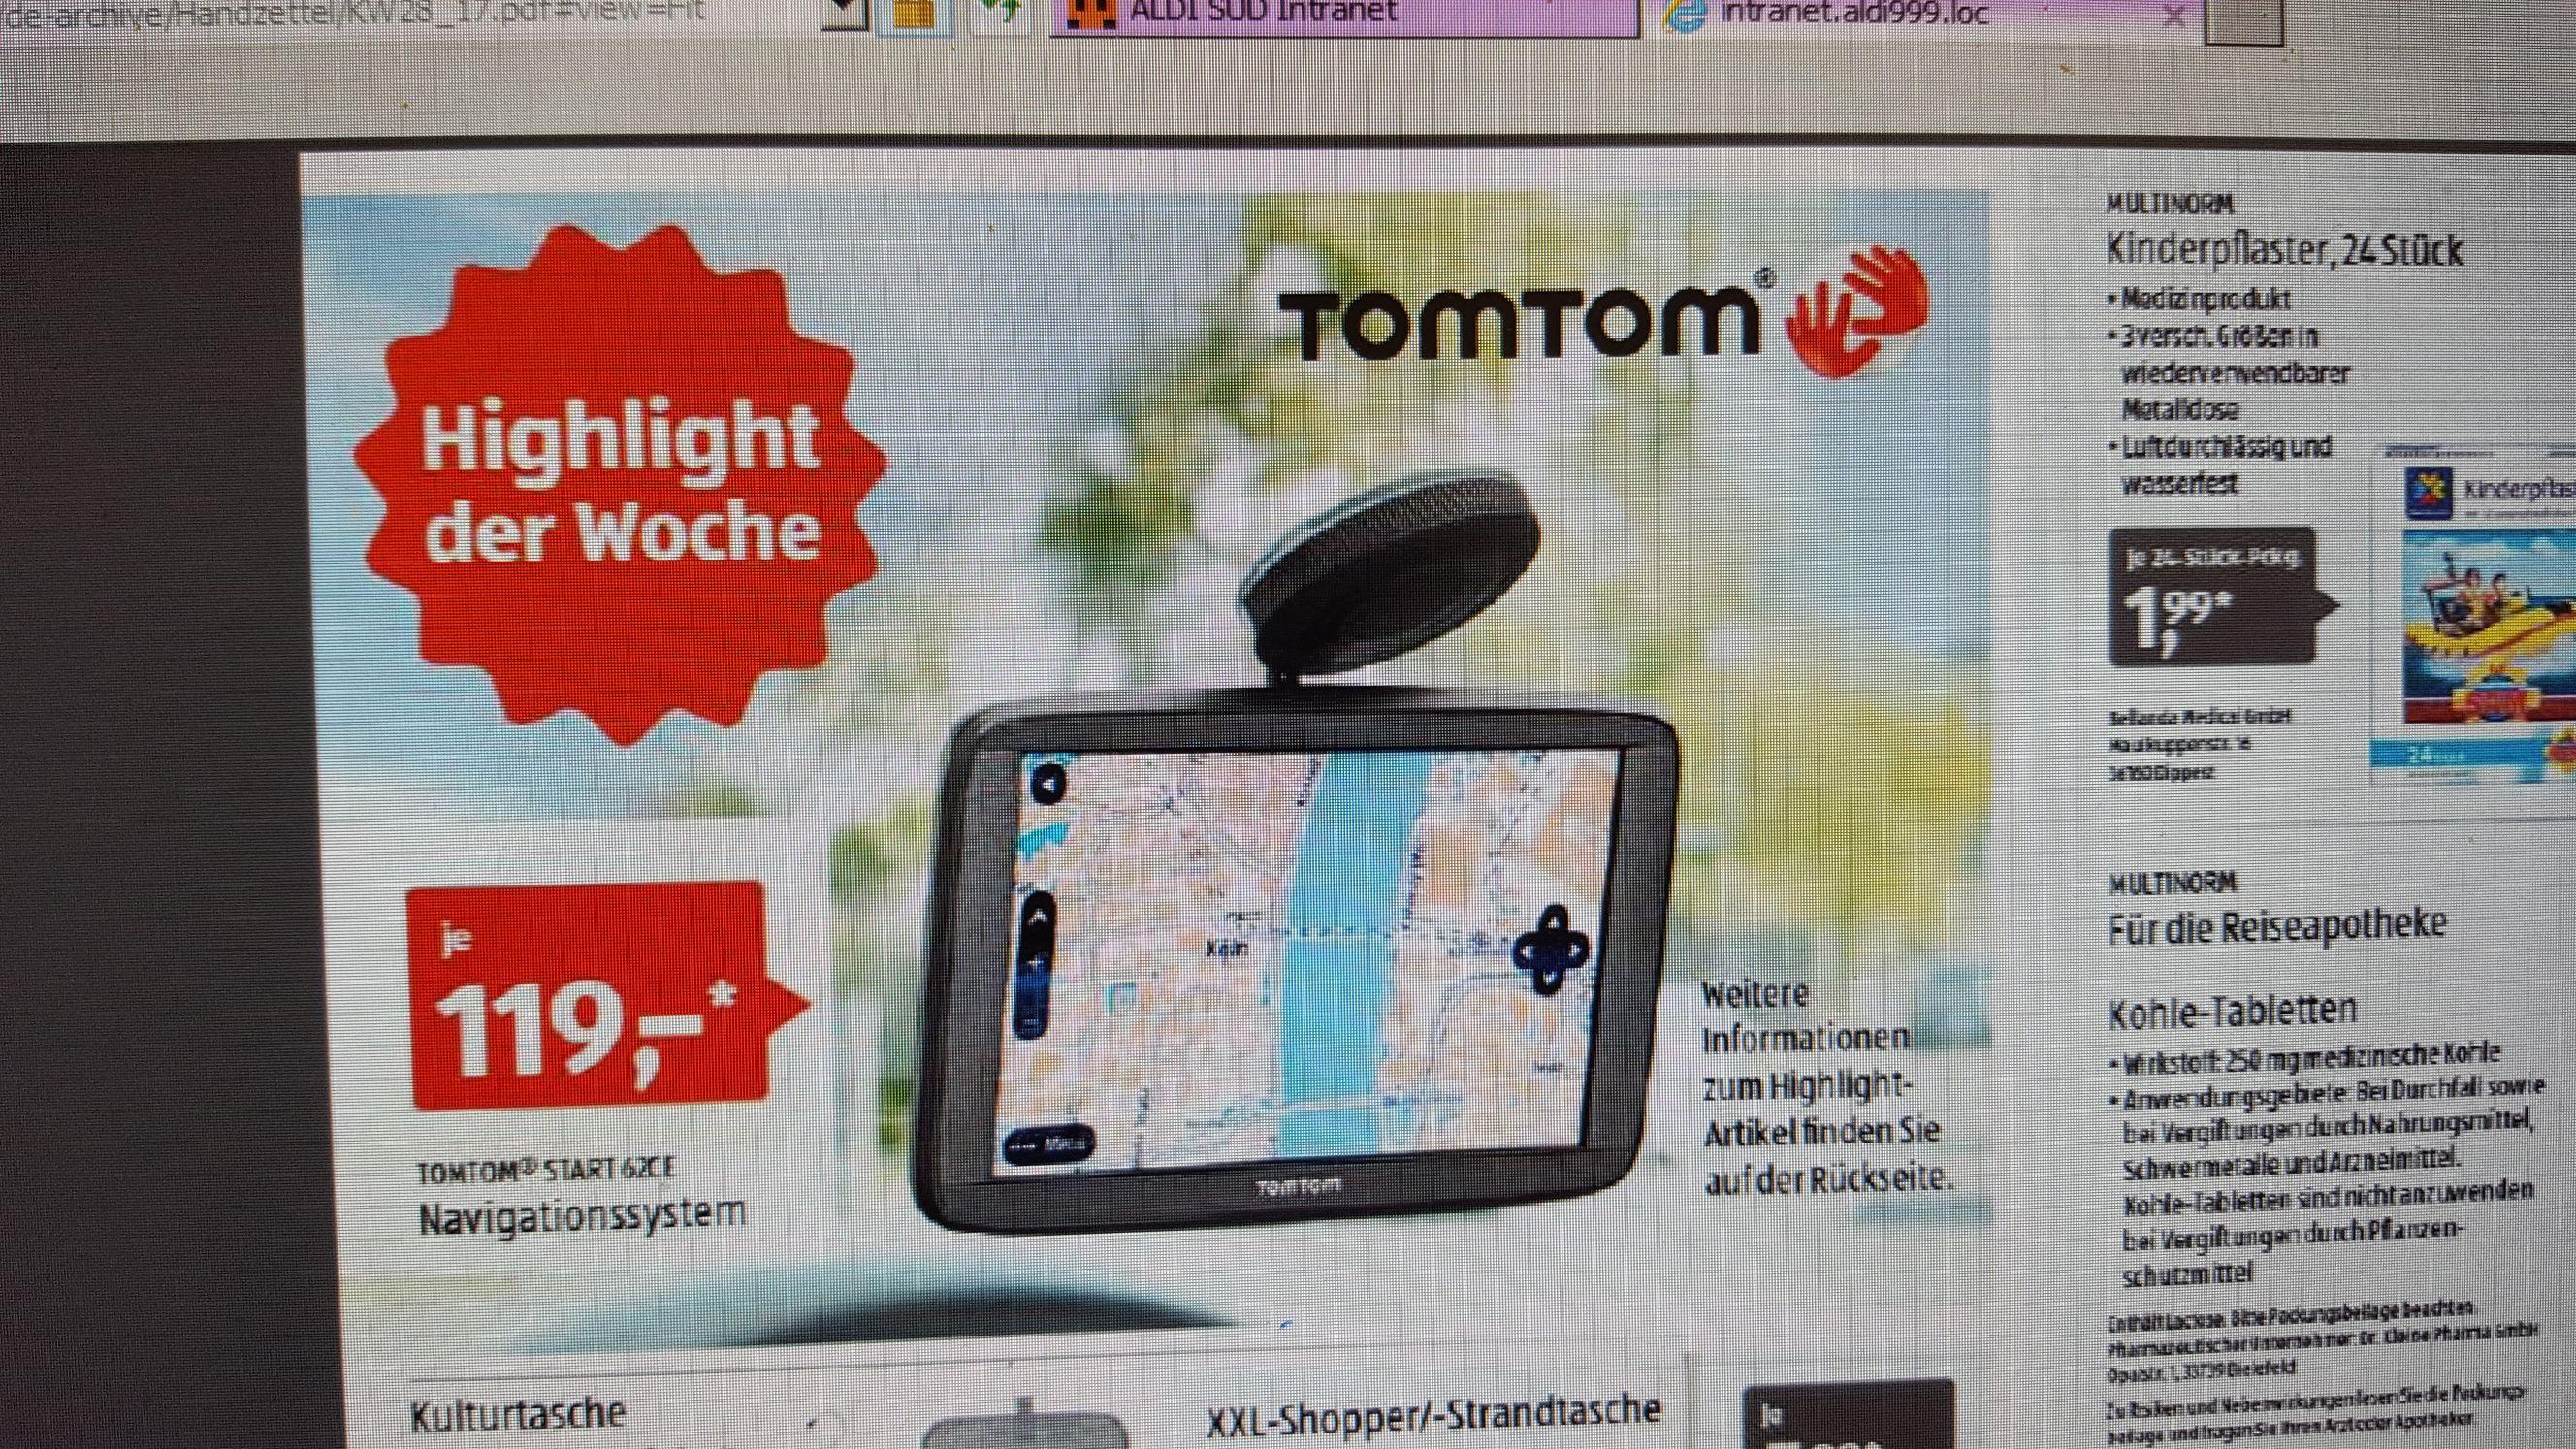 [Aldi Süd] TomTom Start 62 Navigationssystem